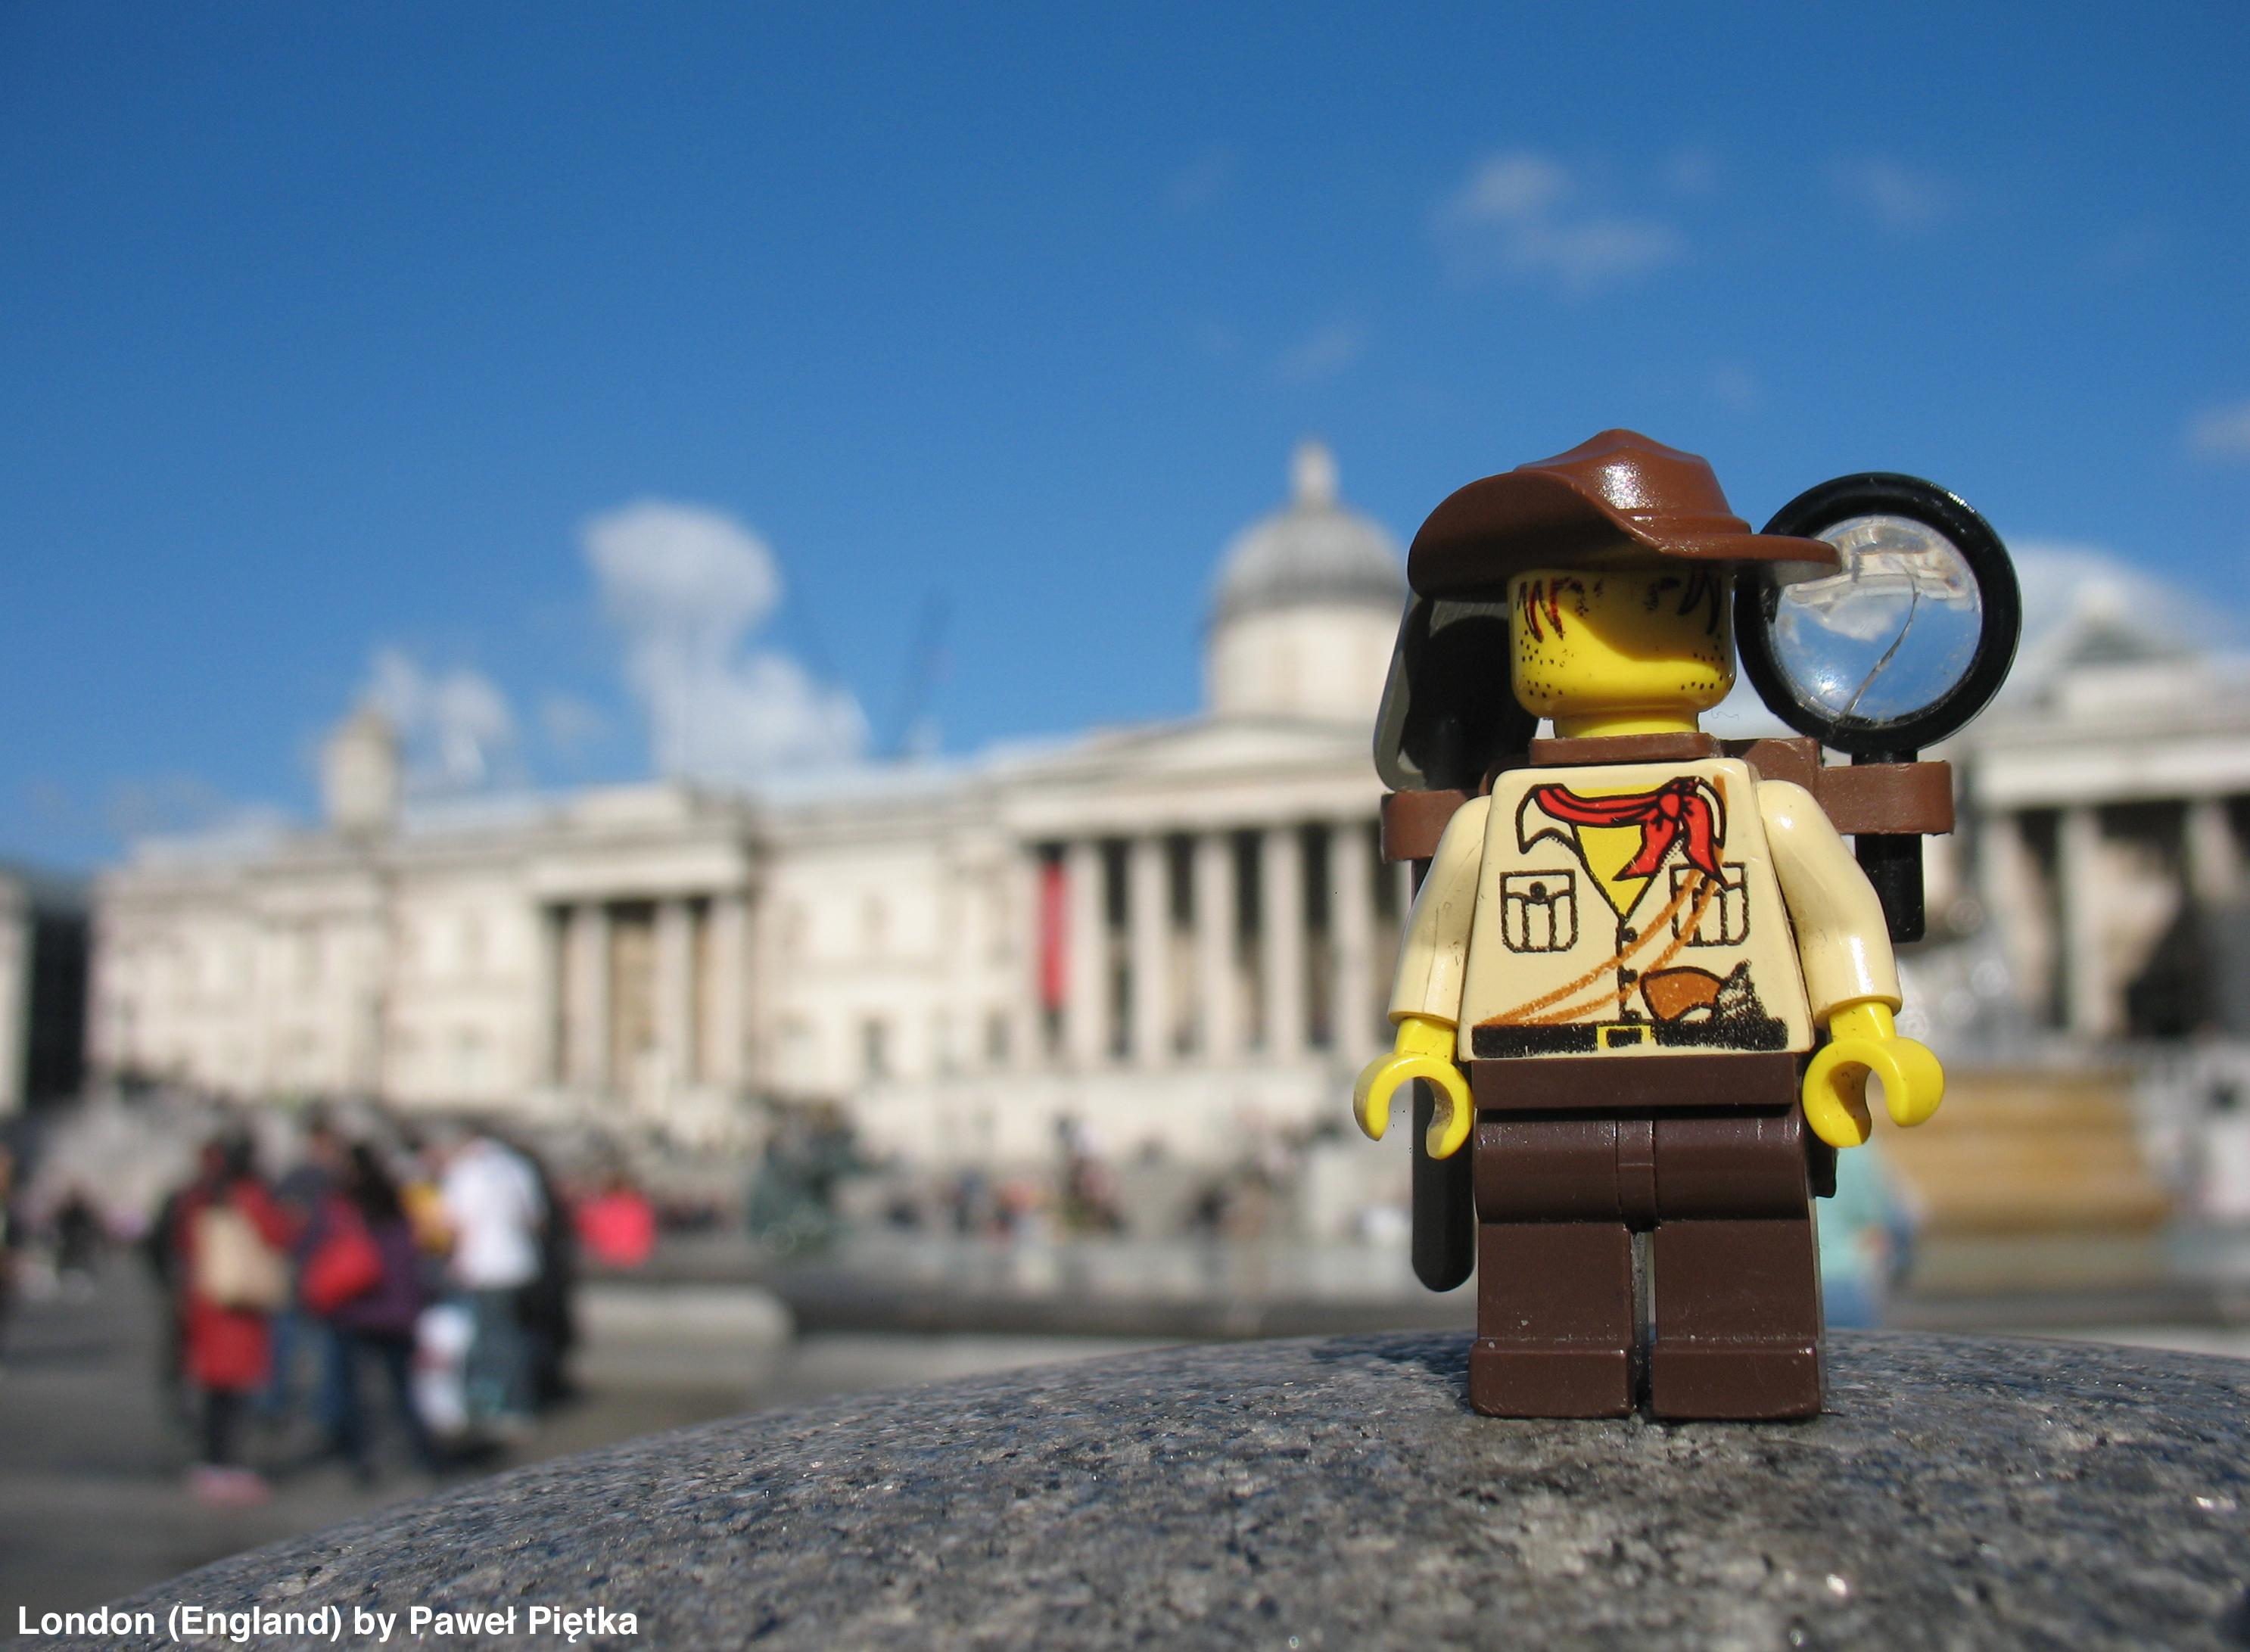 London (England) - Trafalgar Square National Gallery